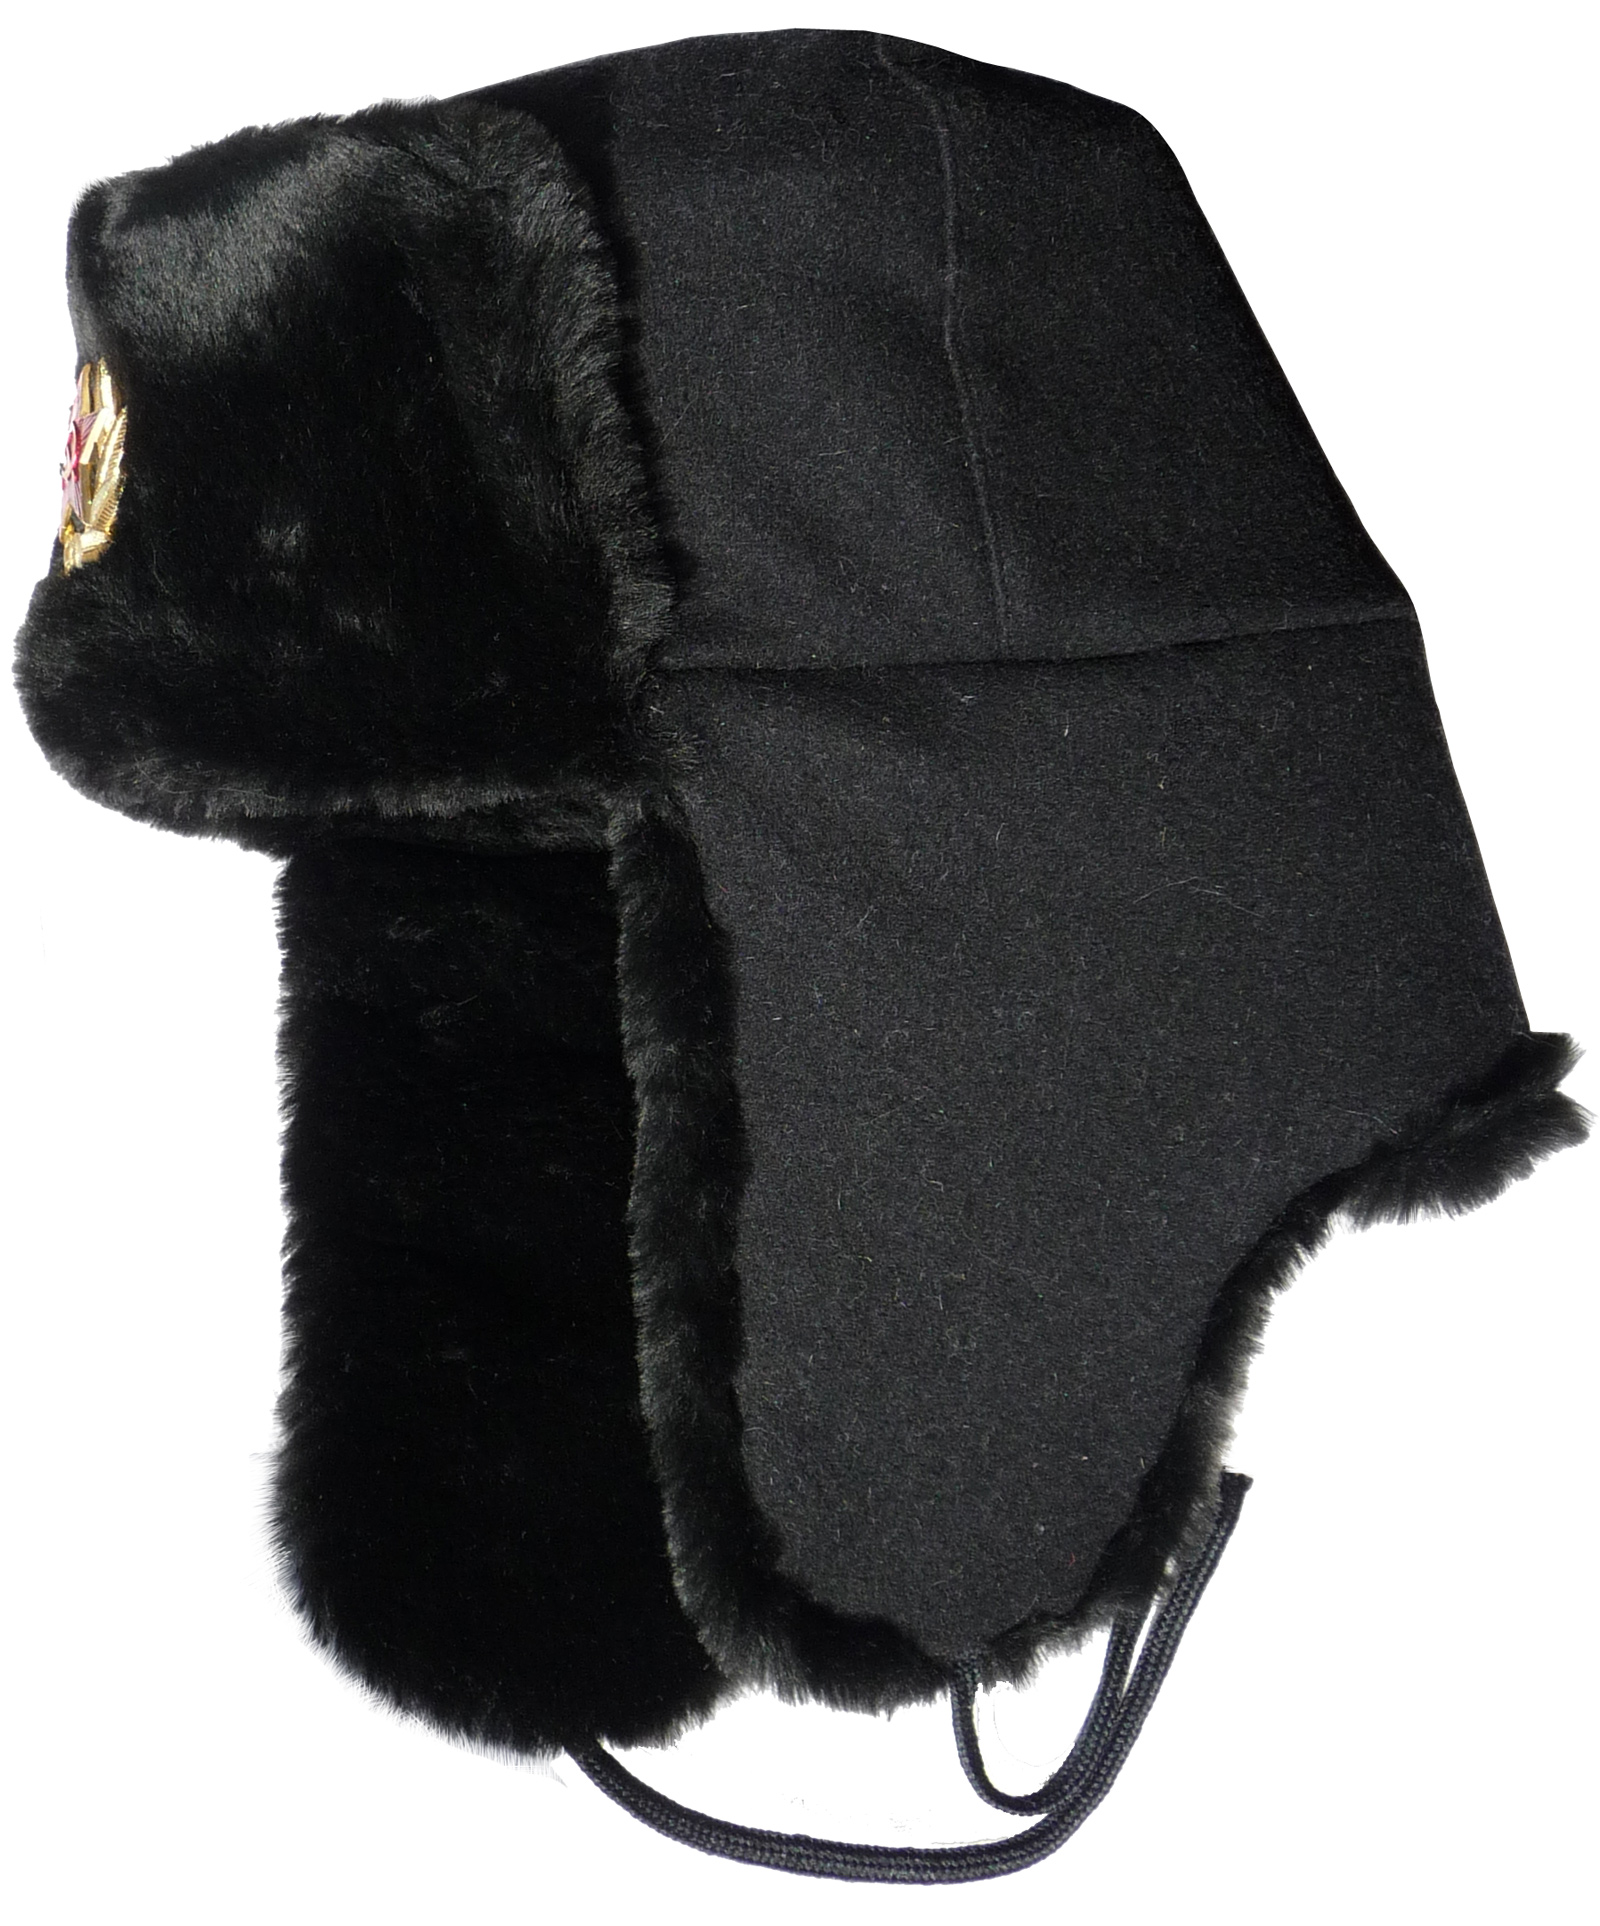 Russian Navy seaman ushanka winter hat. Black wool top ...